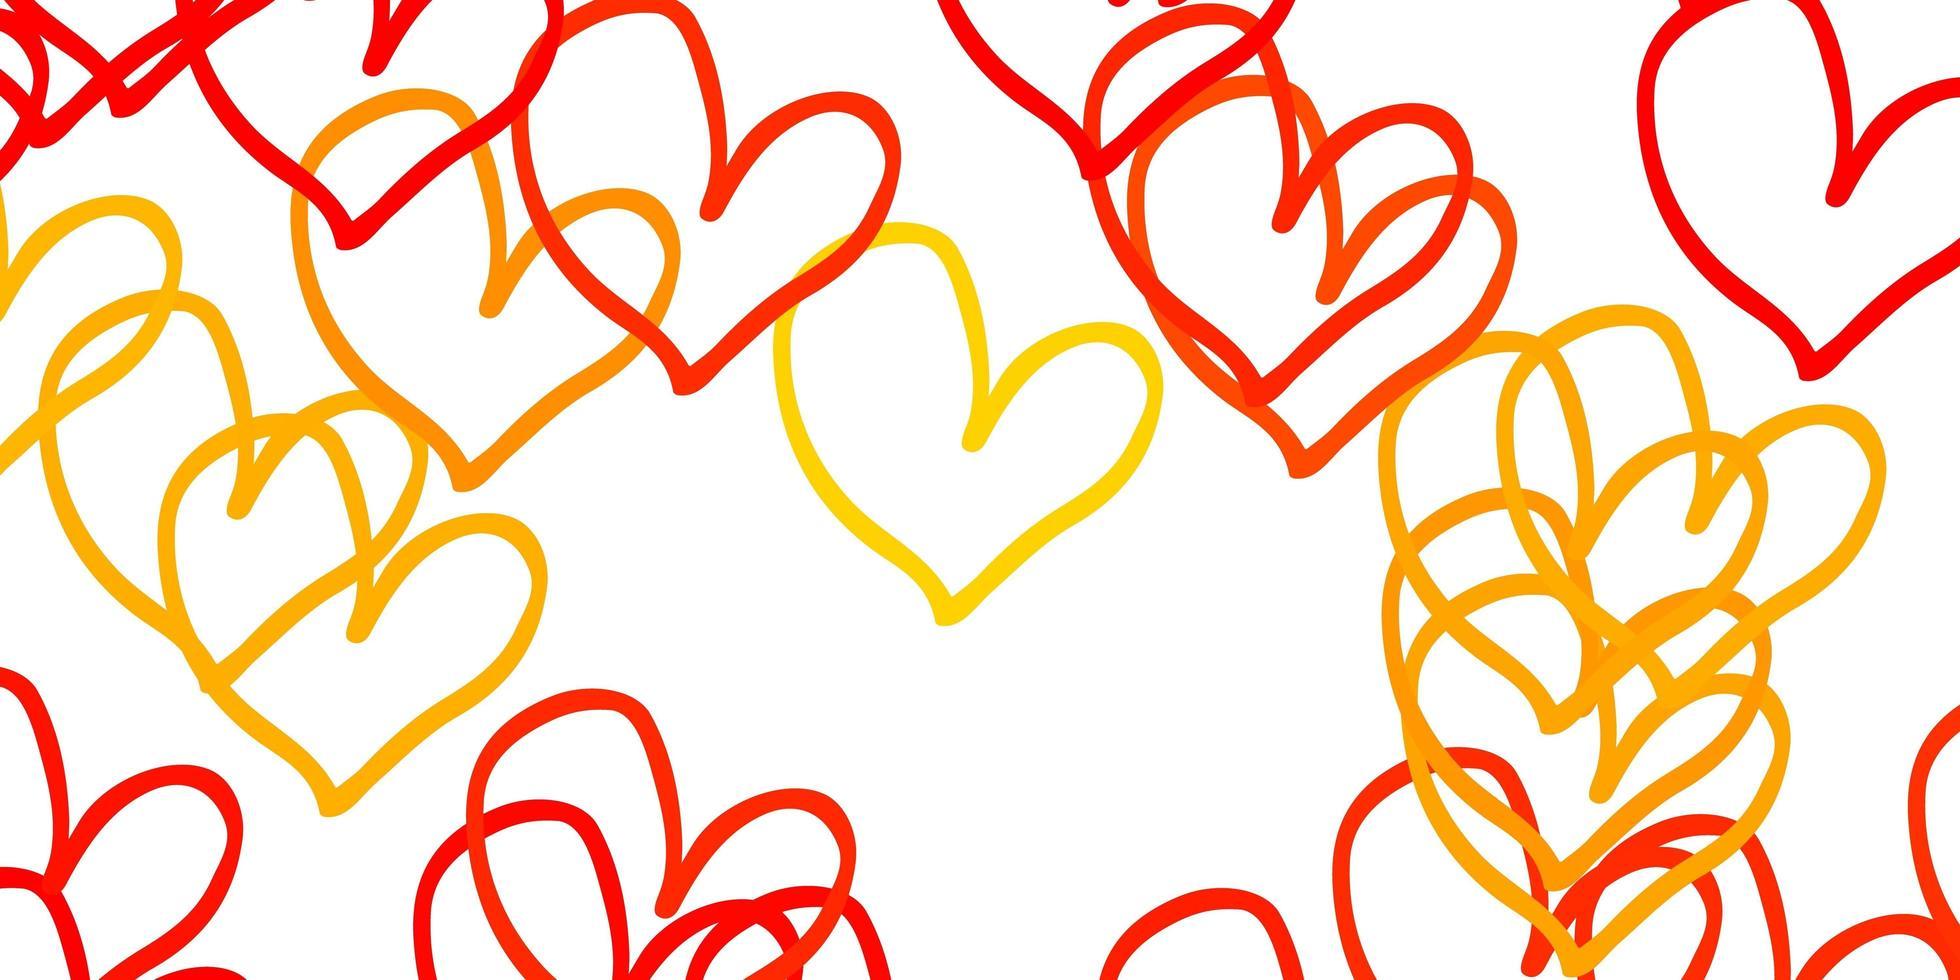 fundo vector laranja claro com corações.